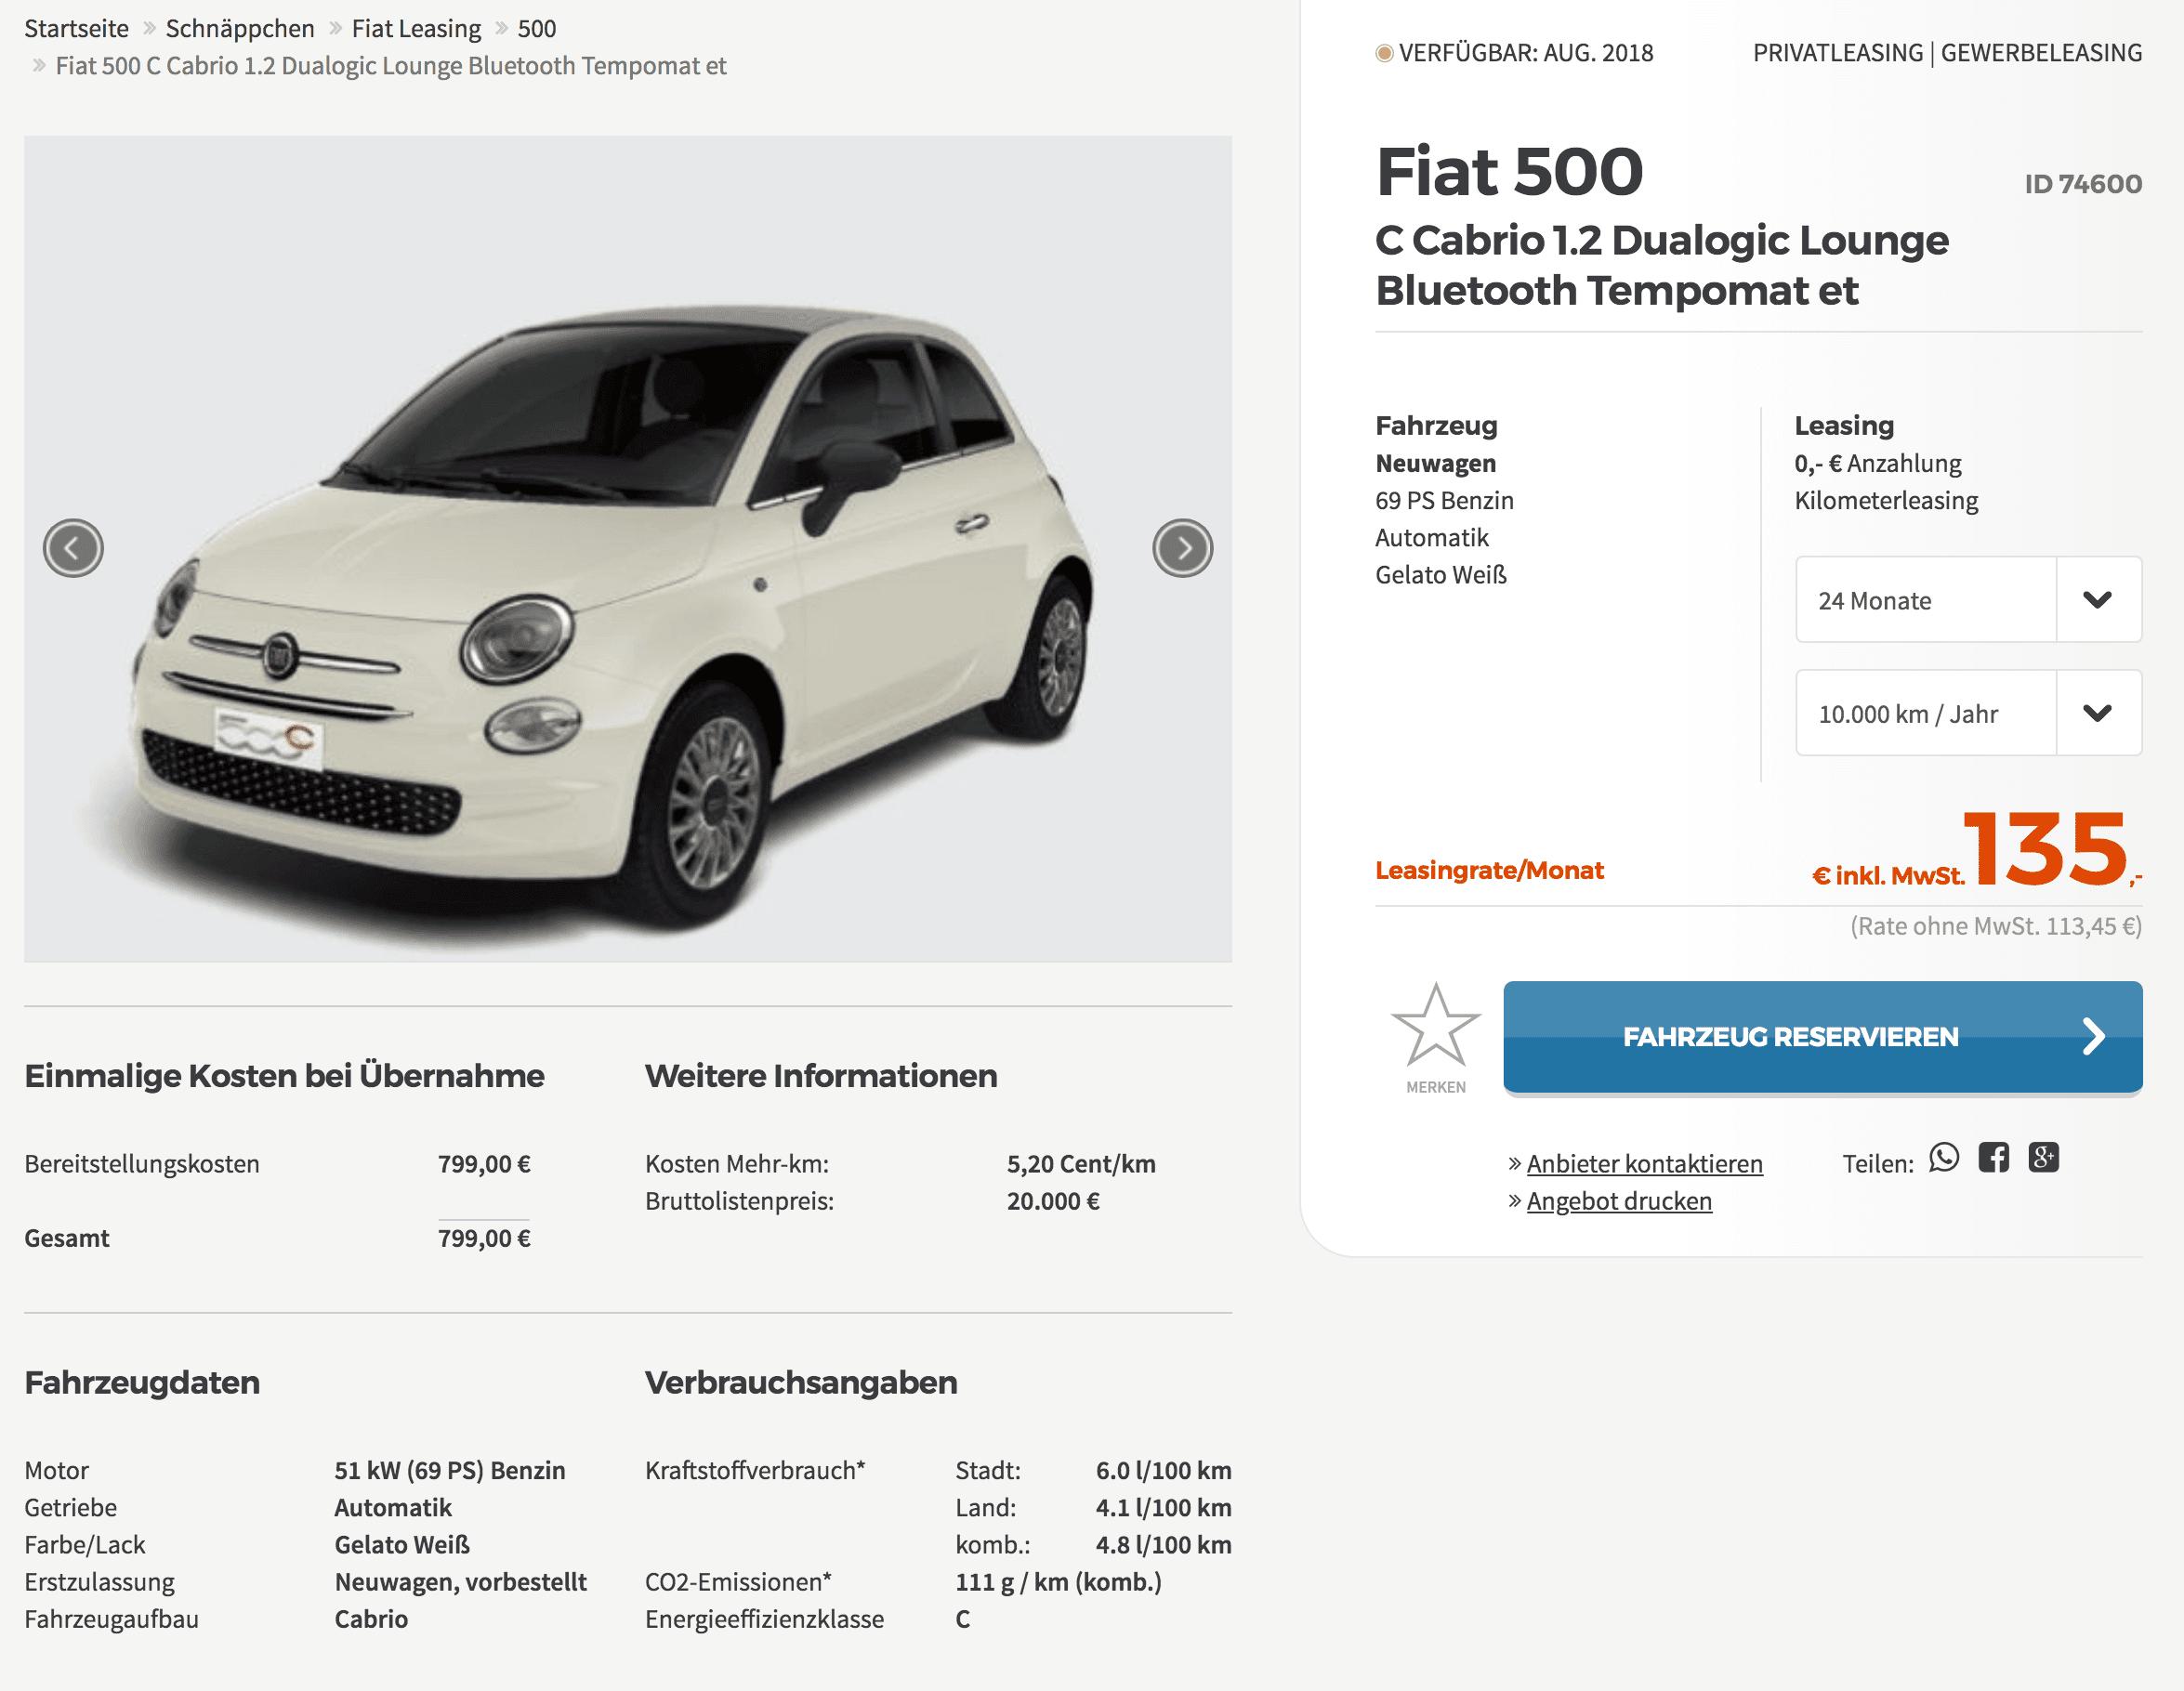 fiat 500c cabrio leasing f r 135 euro im monat brutto 24. Black Bedroom Furniture Sets. Home Design Ideas